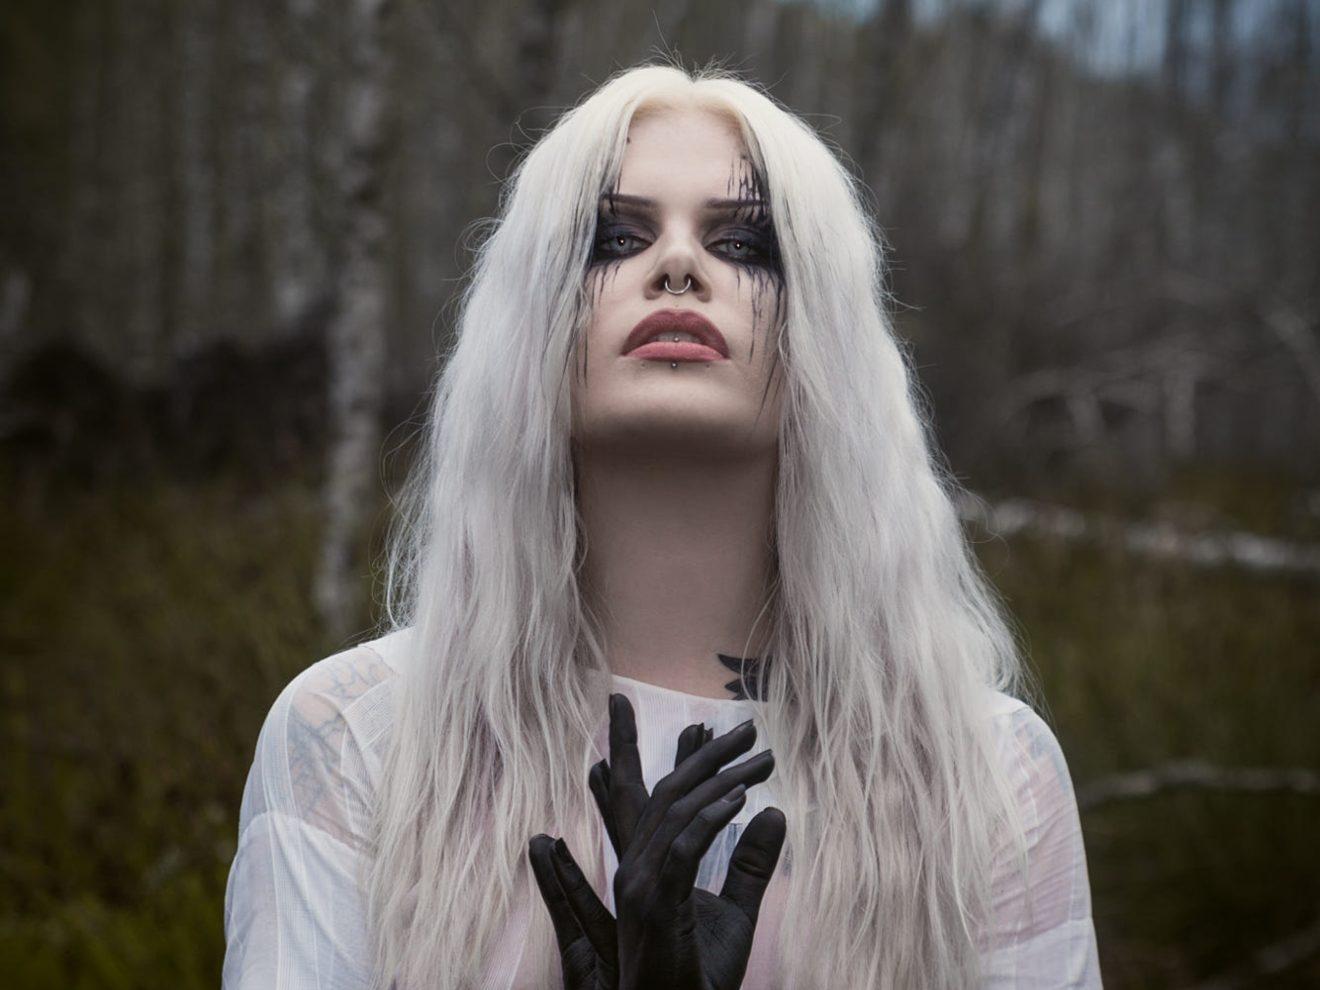 Goth Subculture Spirituality and Unique Visual Aesthetics